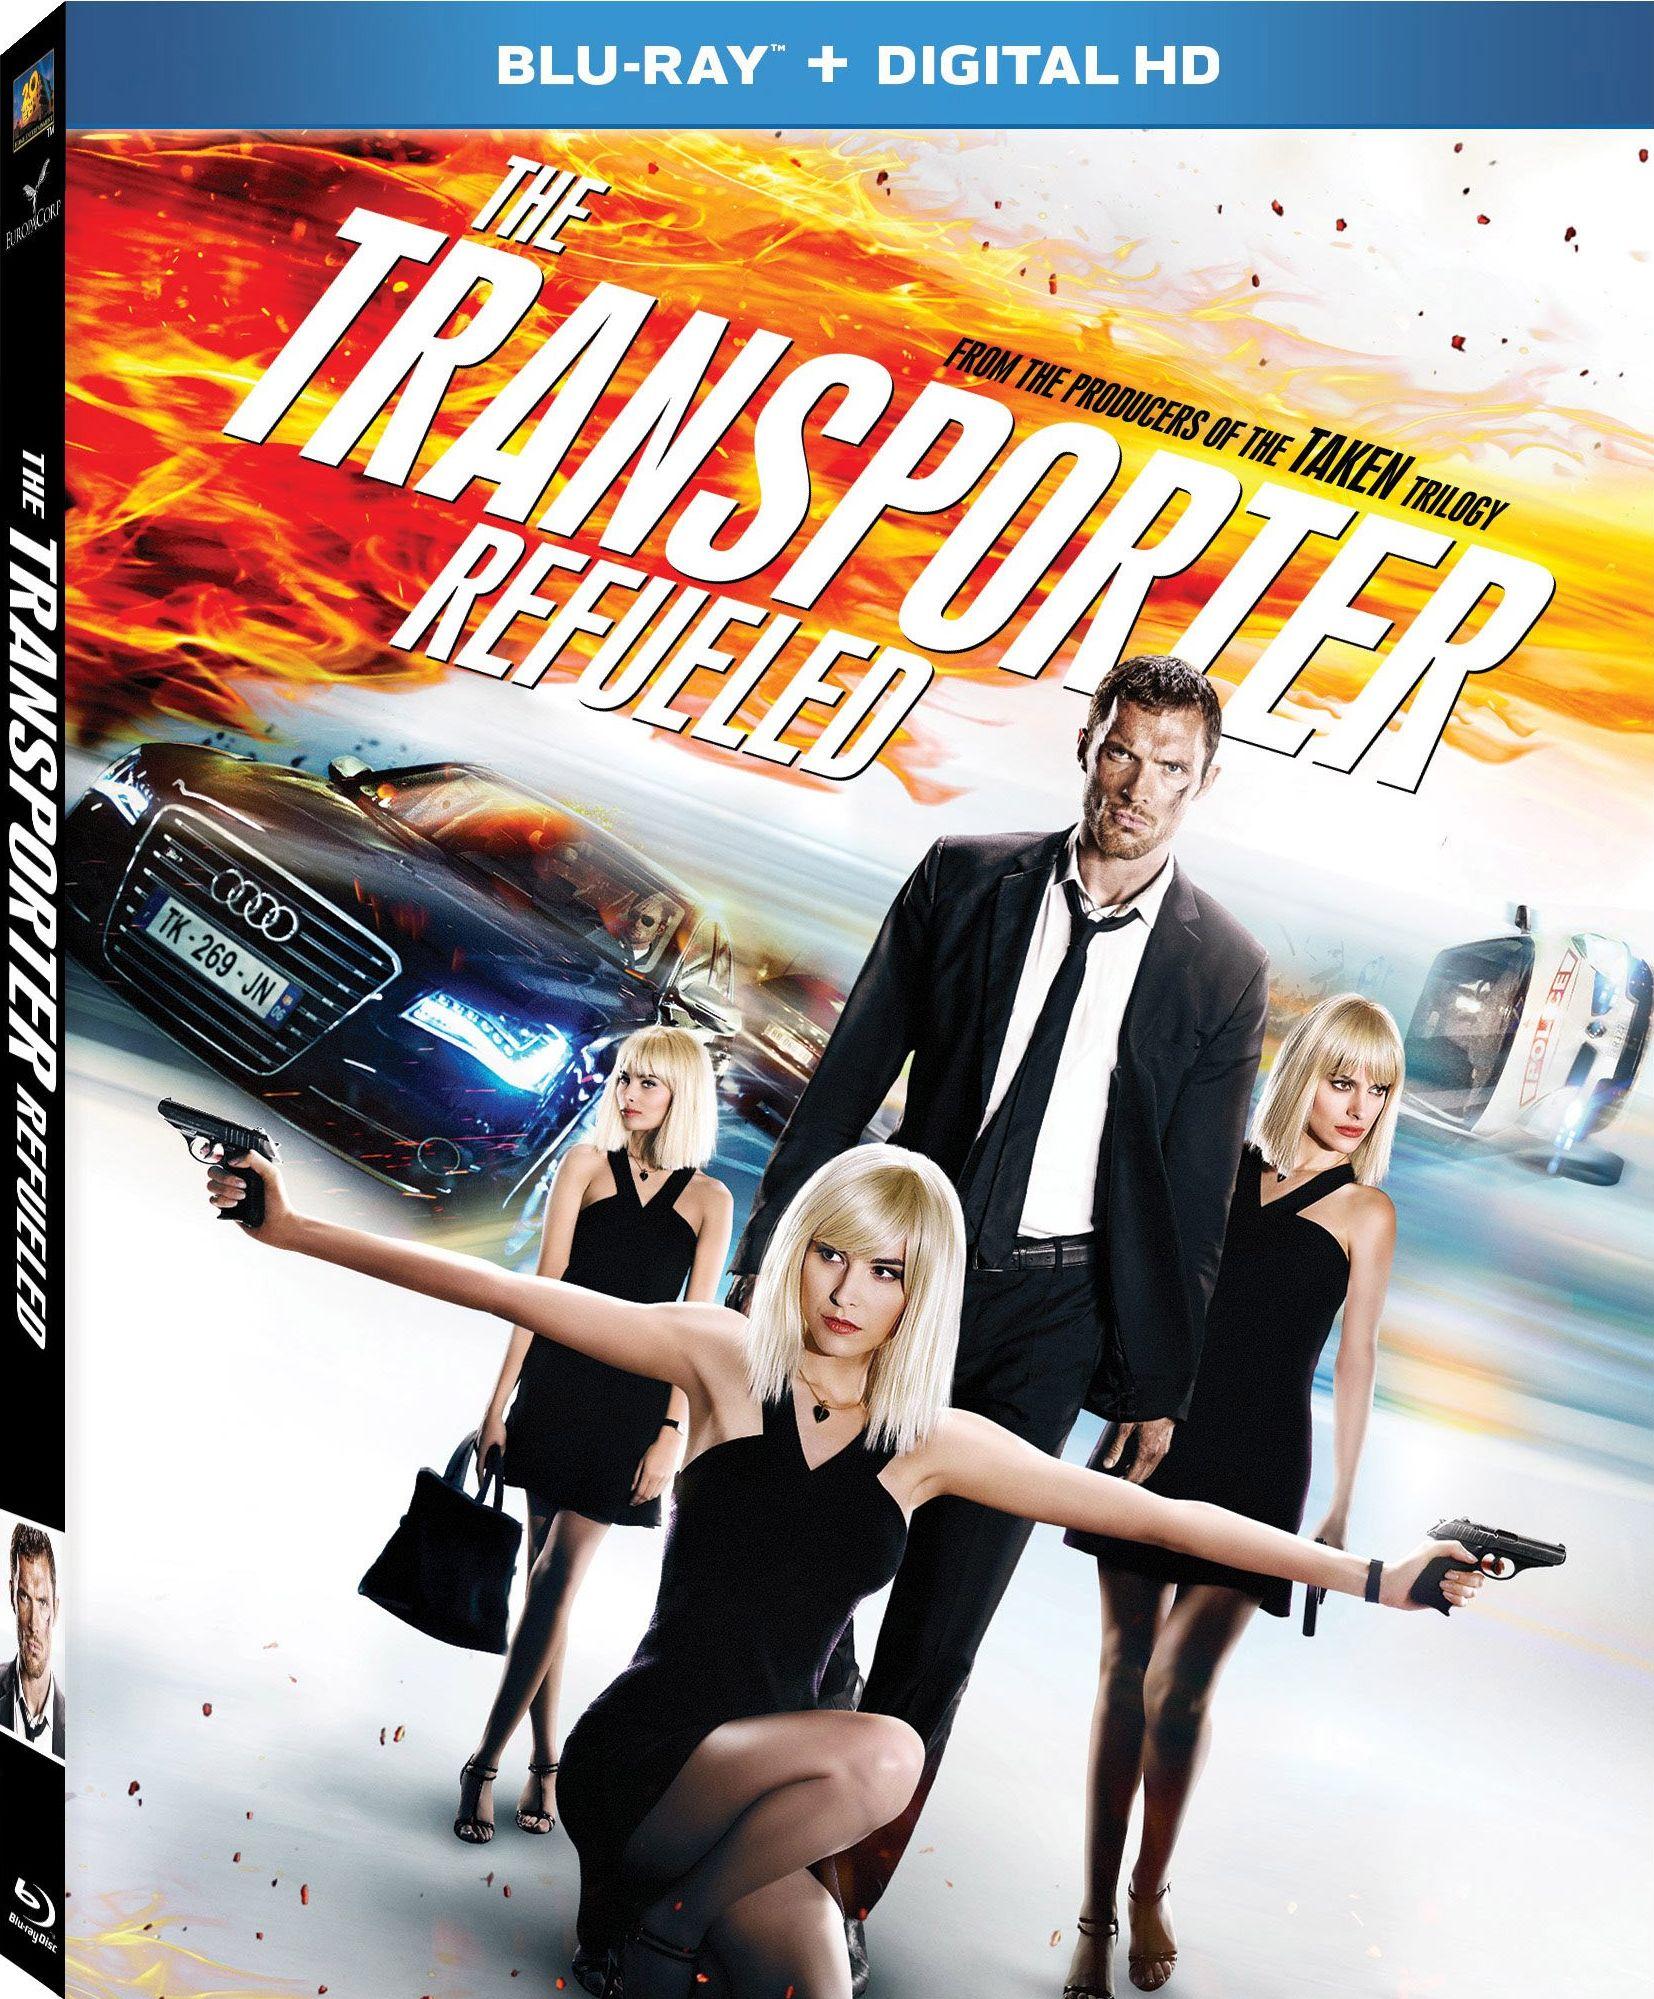 Blu-Ray Review: 'Transporter Refueled' Runs On Empty | FilmFad.com